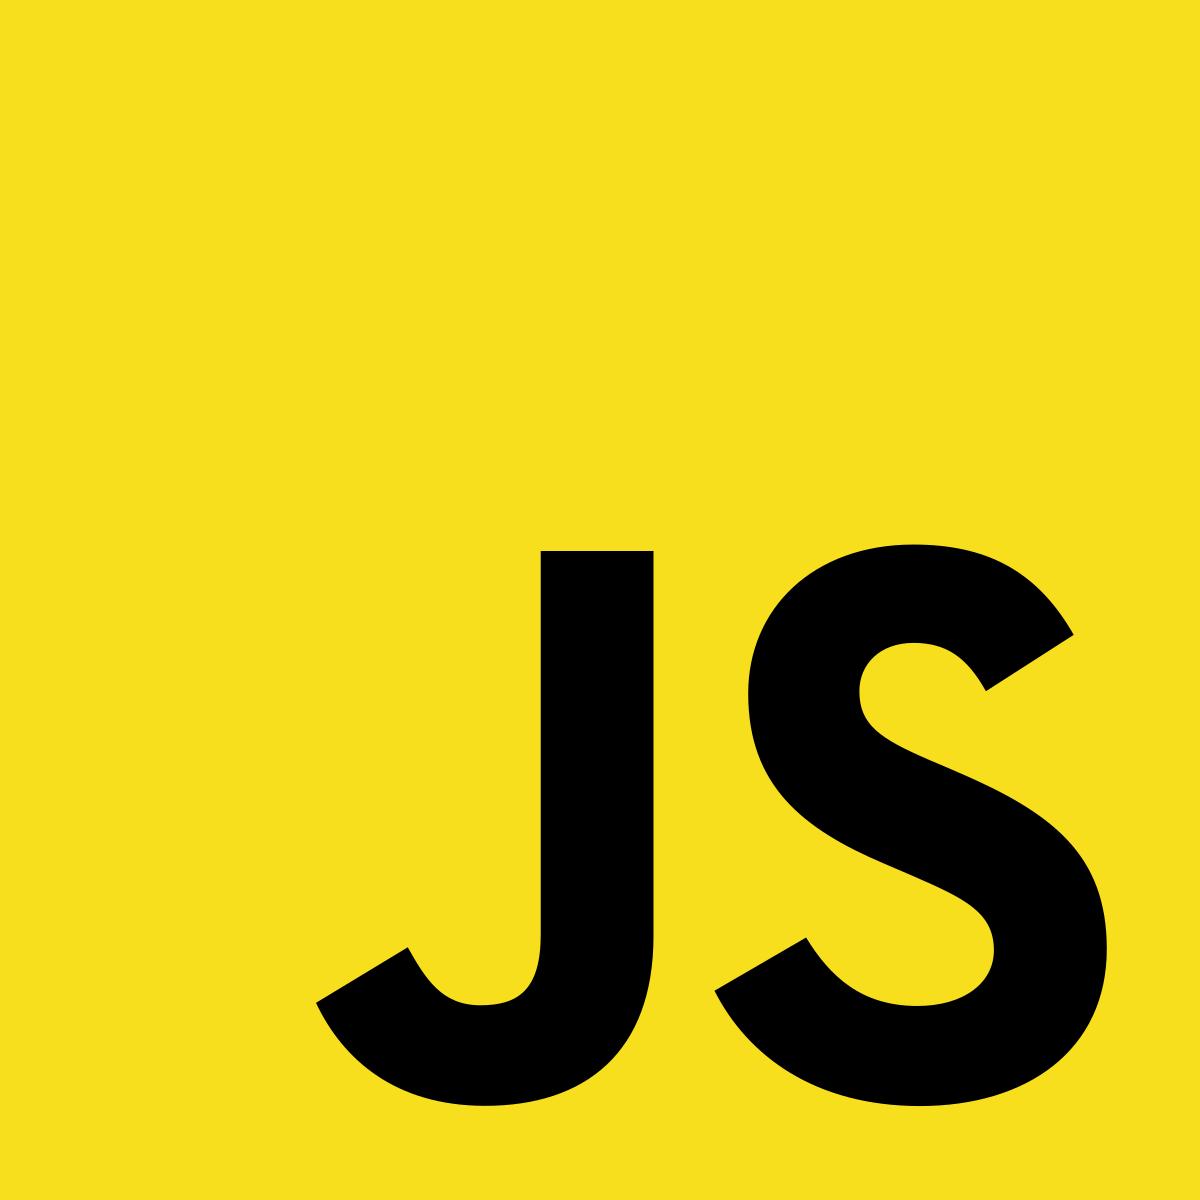 generate-random-string-with-javascript-u4tpv